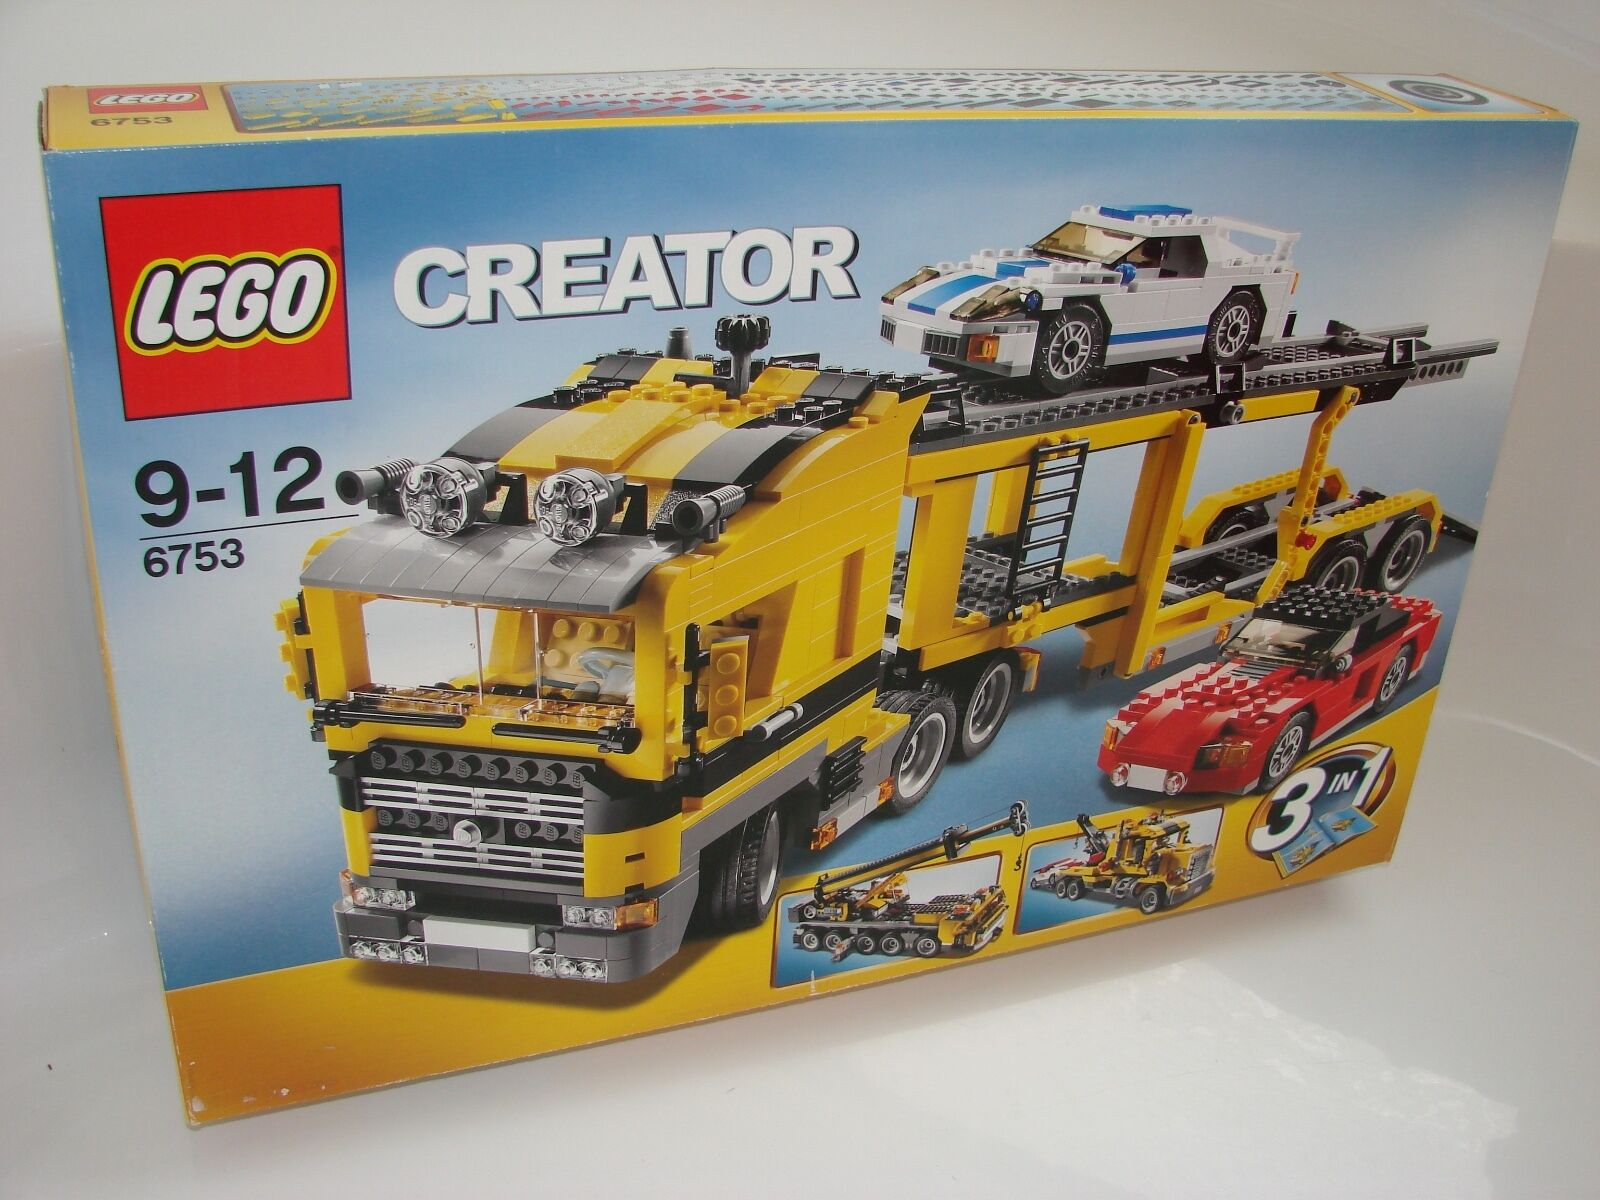 Lego ® Creator 6753 auto Transporter nuevo _ Highway transporte Mobile Crane TOW Truck